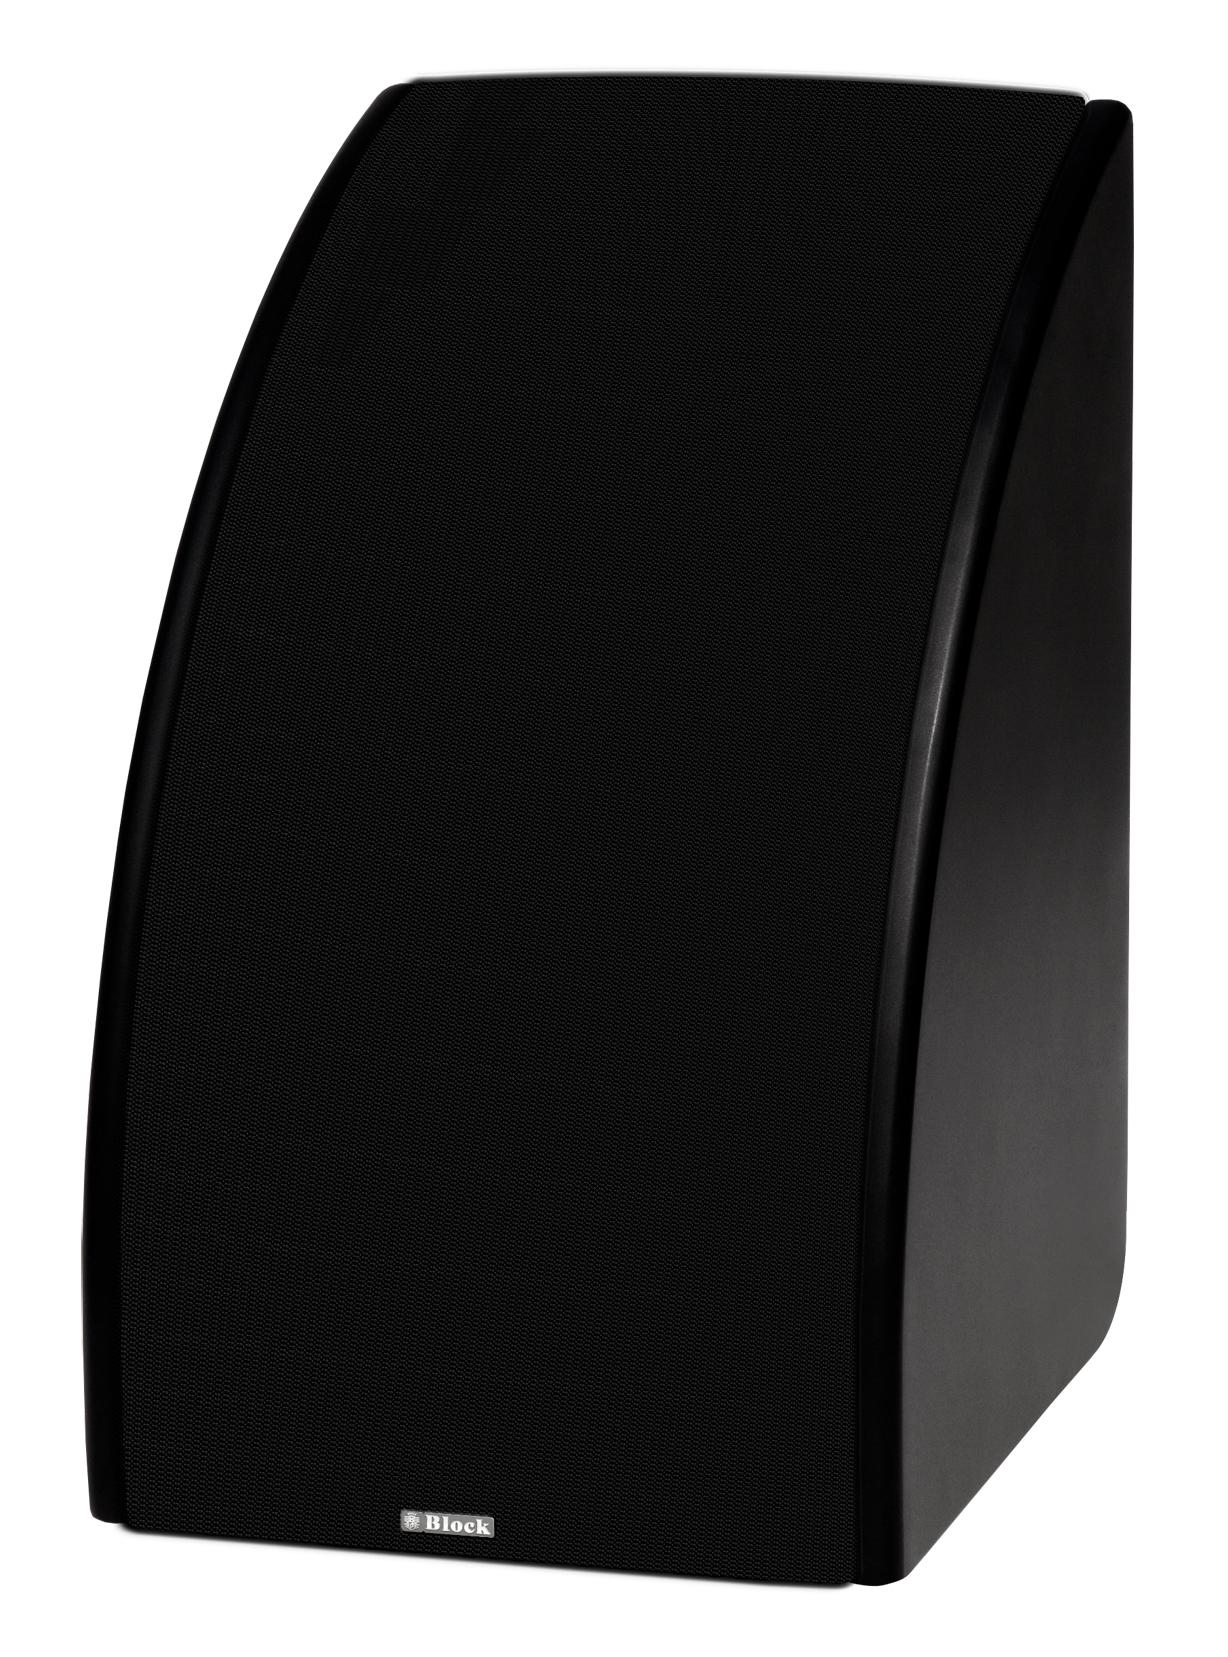 Block XS-100 Subwoofer